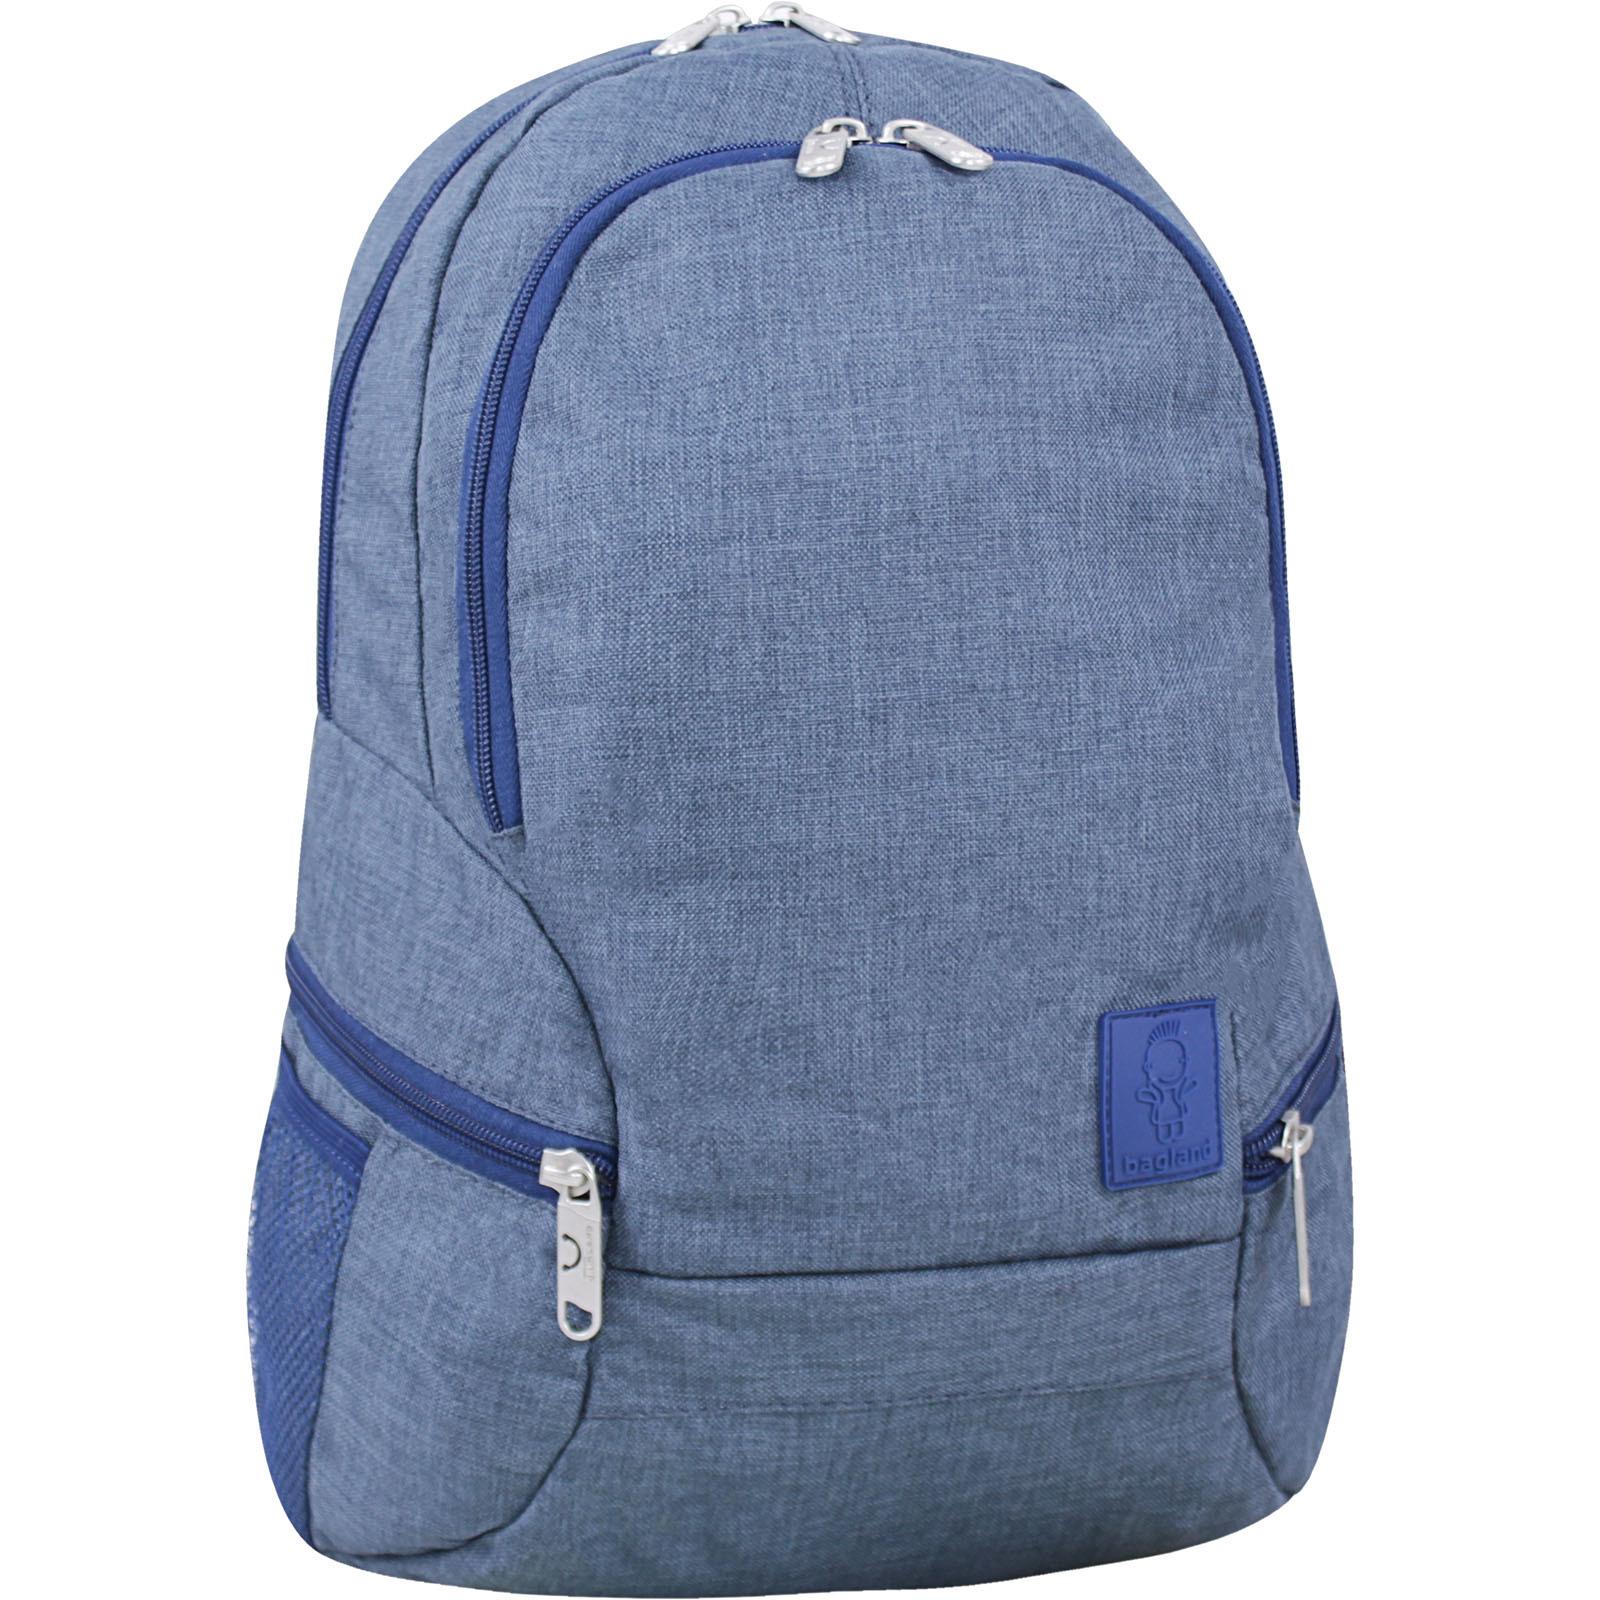 Городские рюкзаки Рюкзак Bagland Urban 20 л. Темно серый (0053069) IMG_6744-1600.jpg